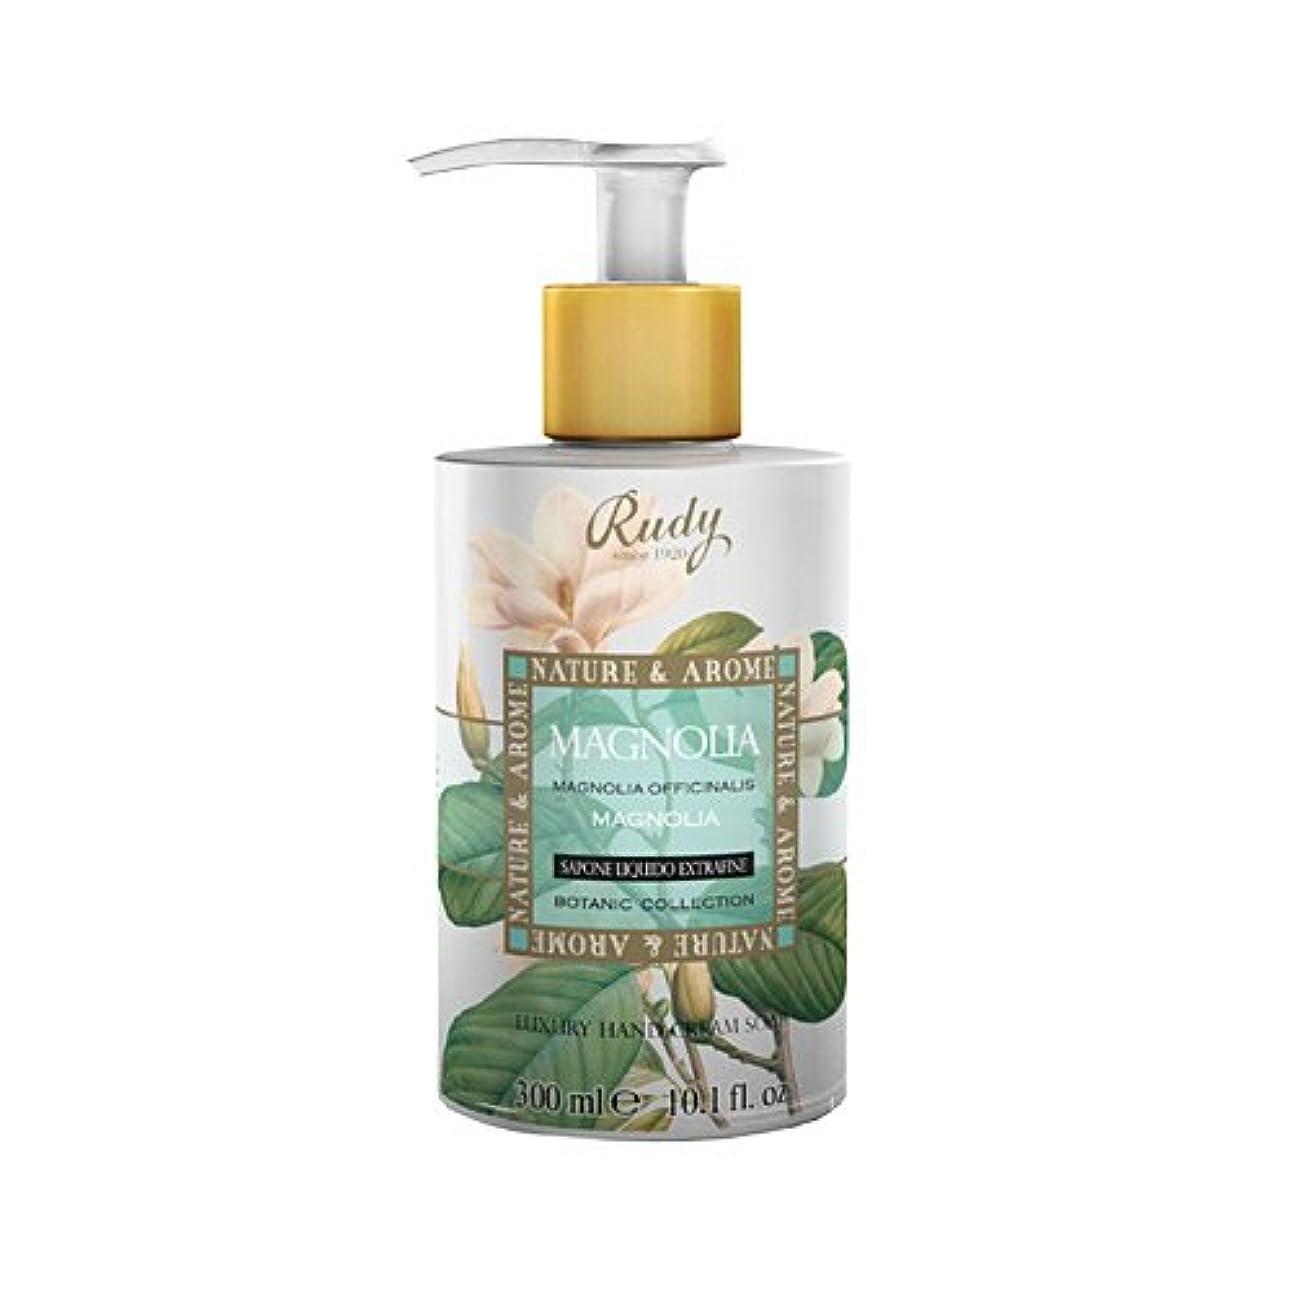 RUDY Nature&Arome SERIES ルディ ナチュール&アロマ Liquid Soap リキッドソープ マグノリア